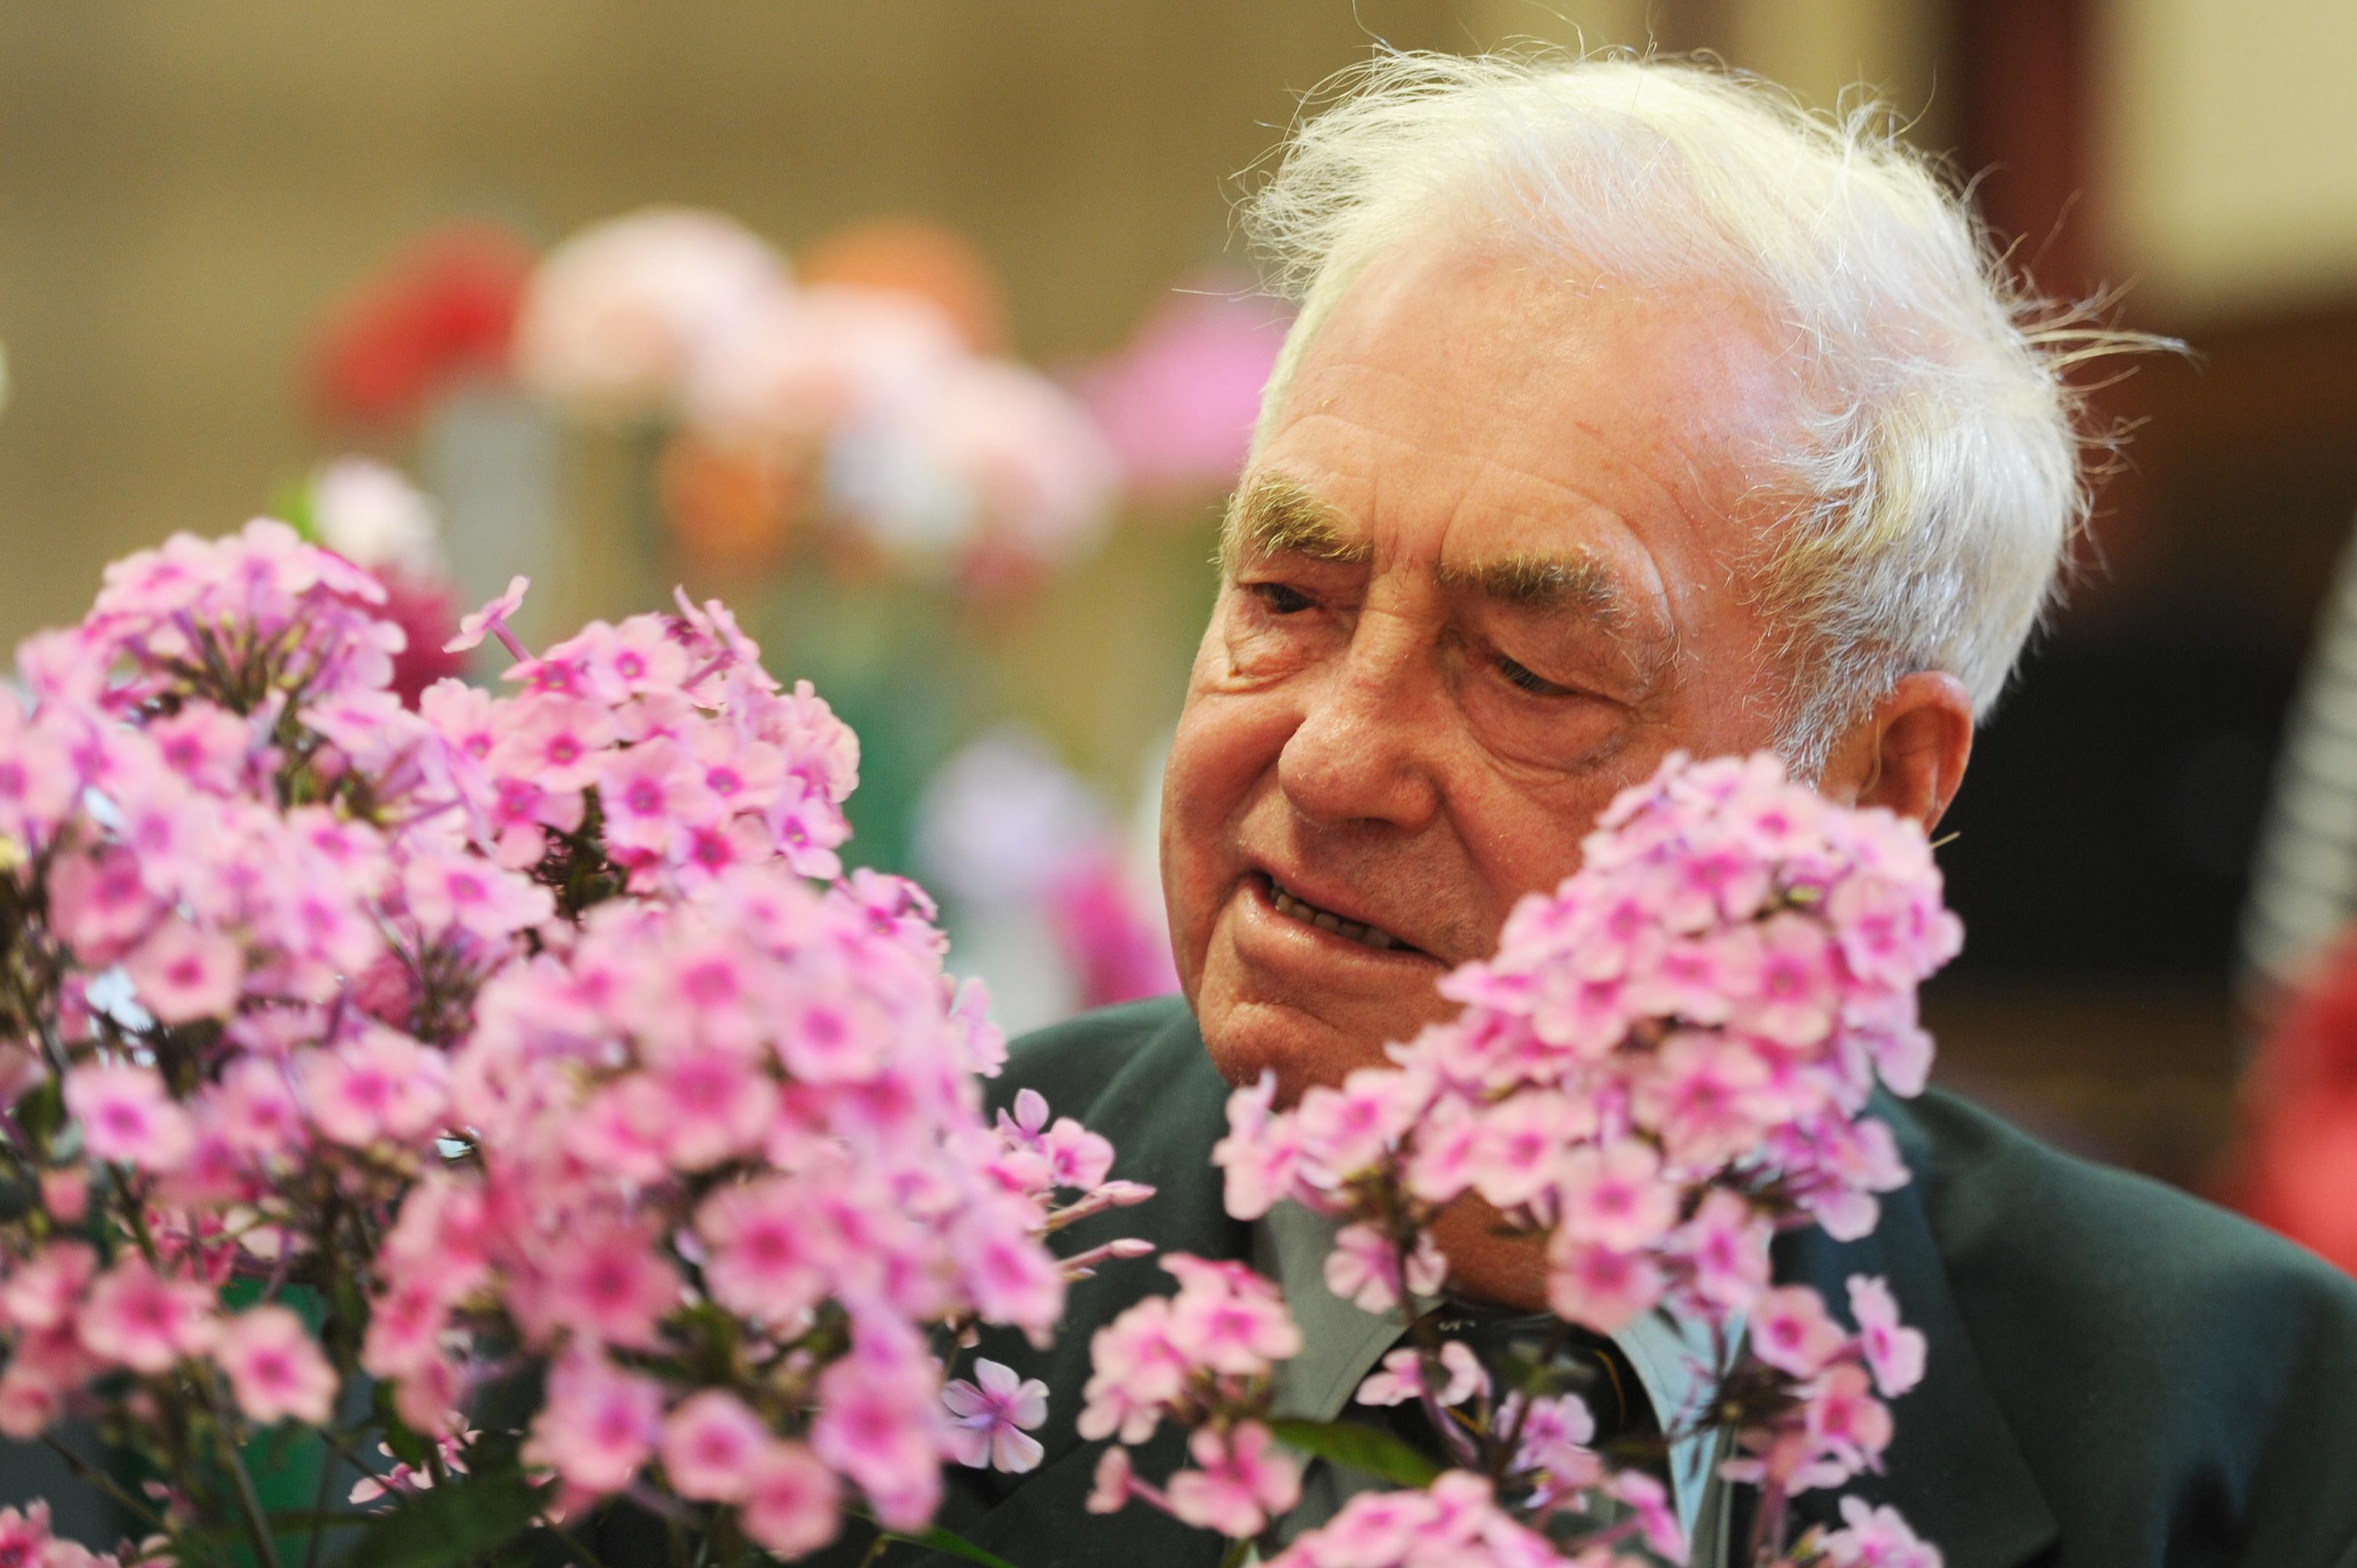 Forfar Horticultural Society Chairman, Les Craib with his phlox plant.